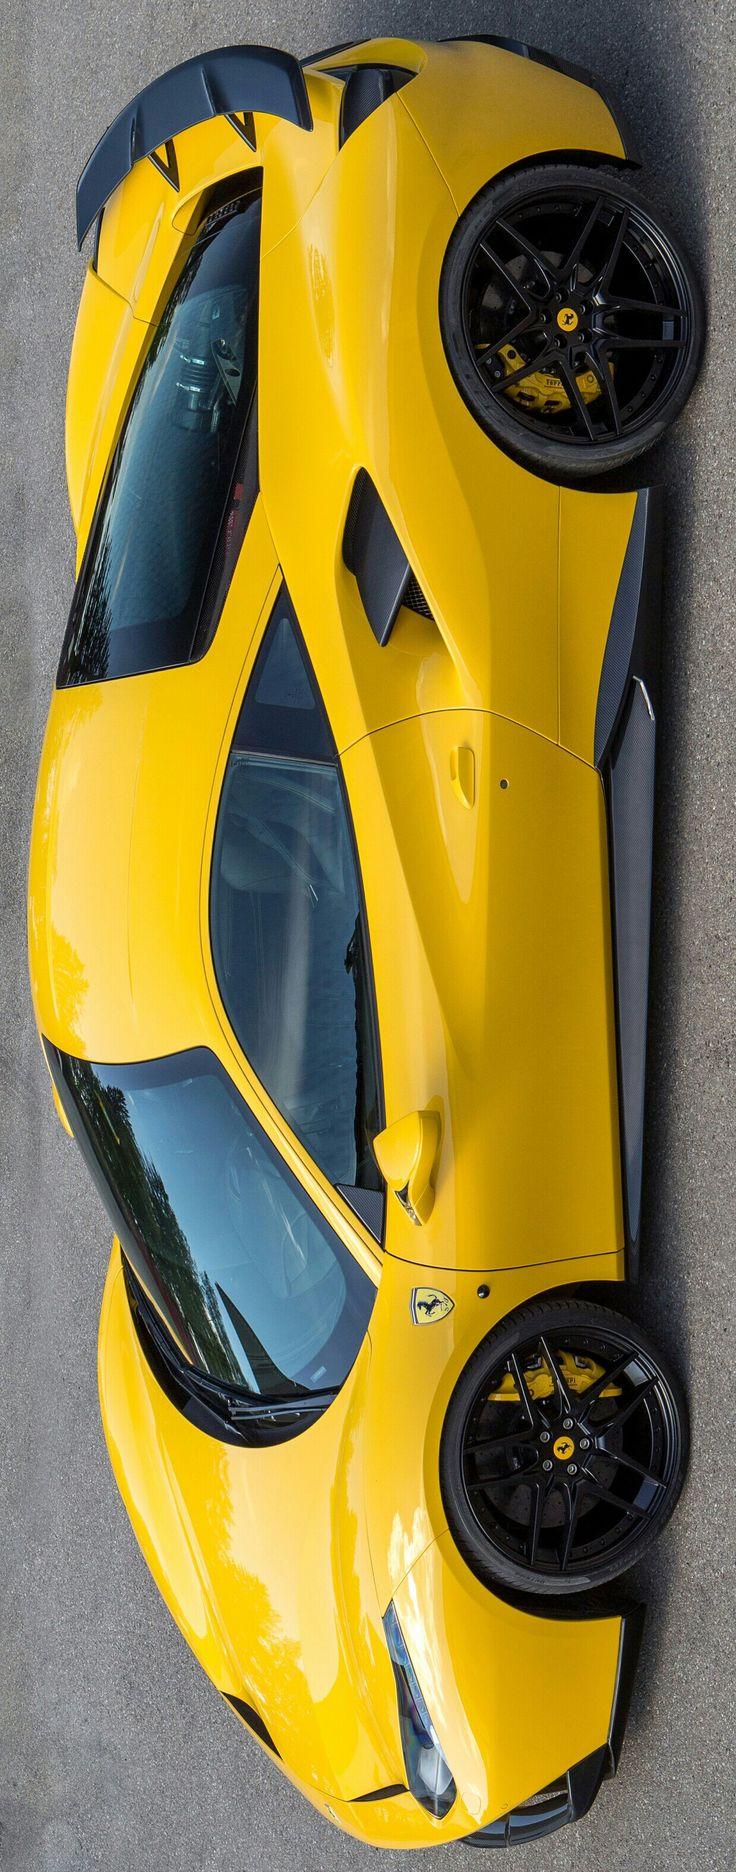 2016 Novitec Rosso Ferrari 488 GTB by Levon